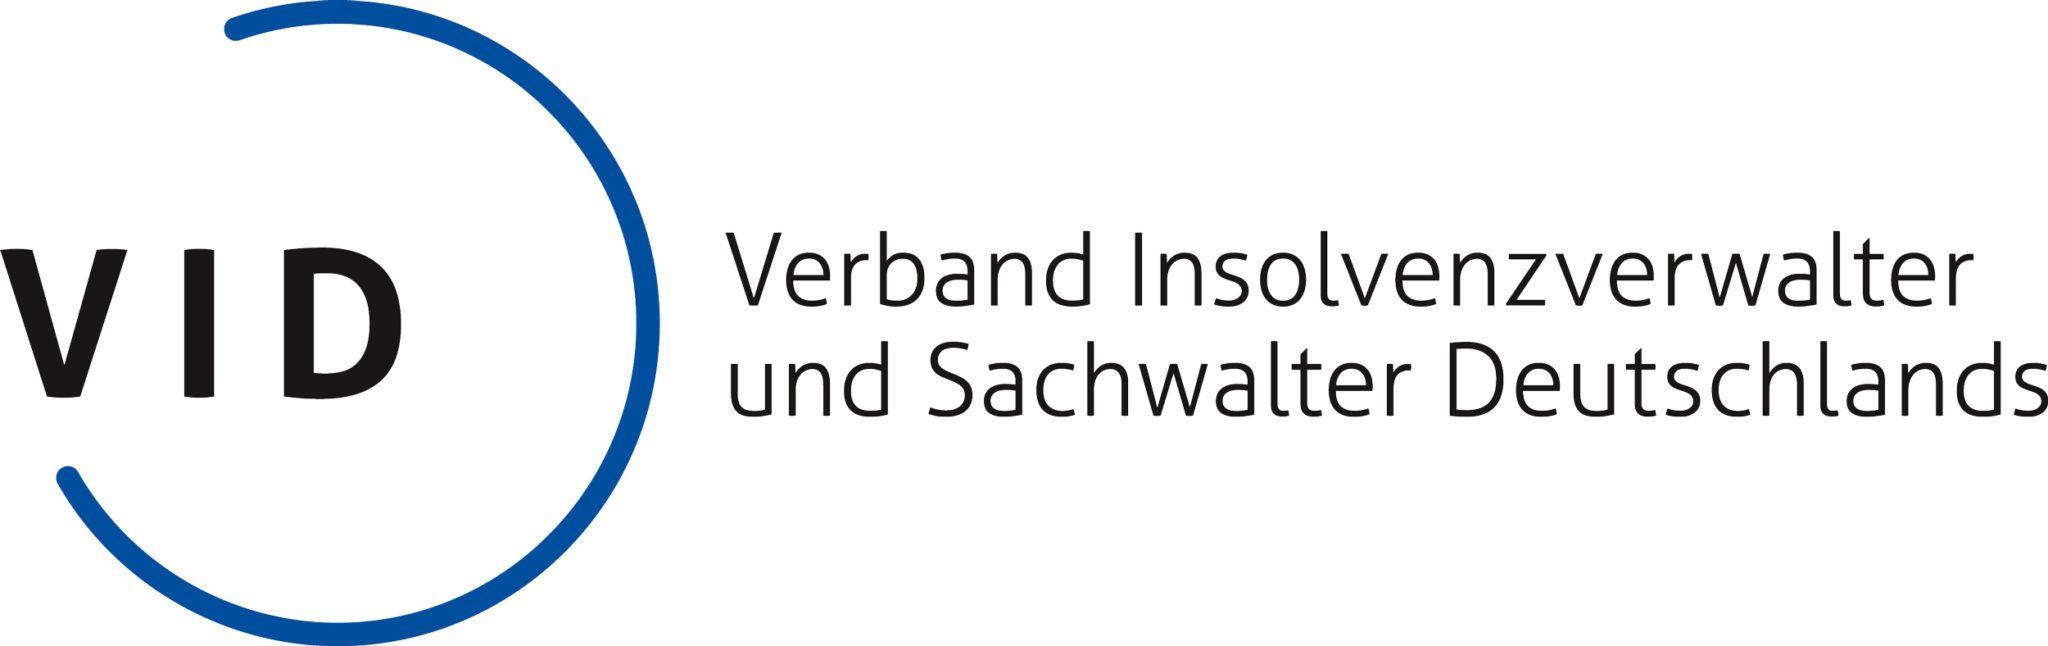 Vid Logo Rgb Office